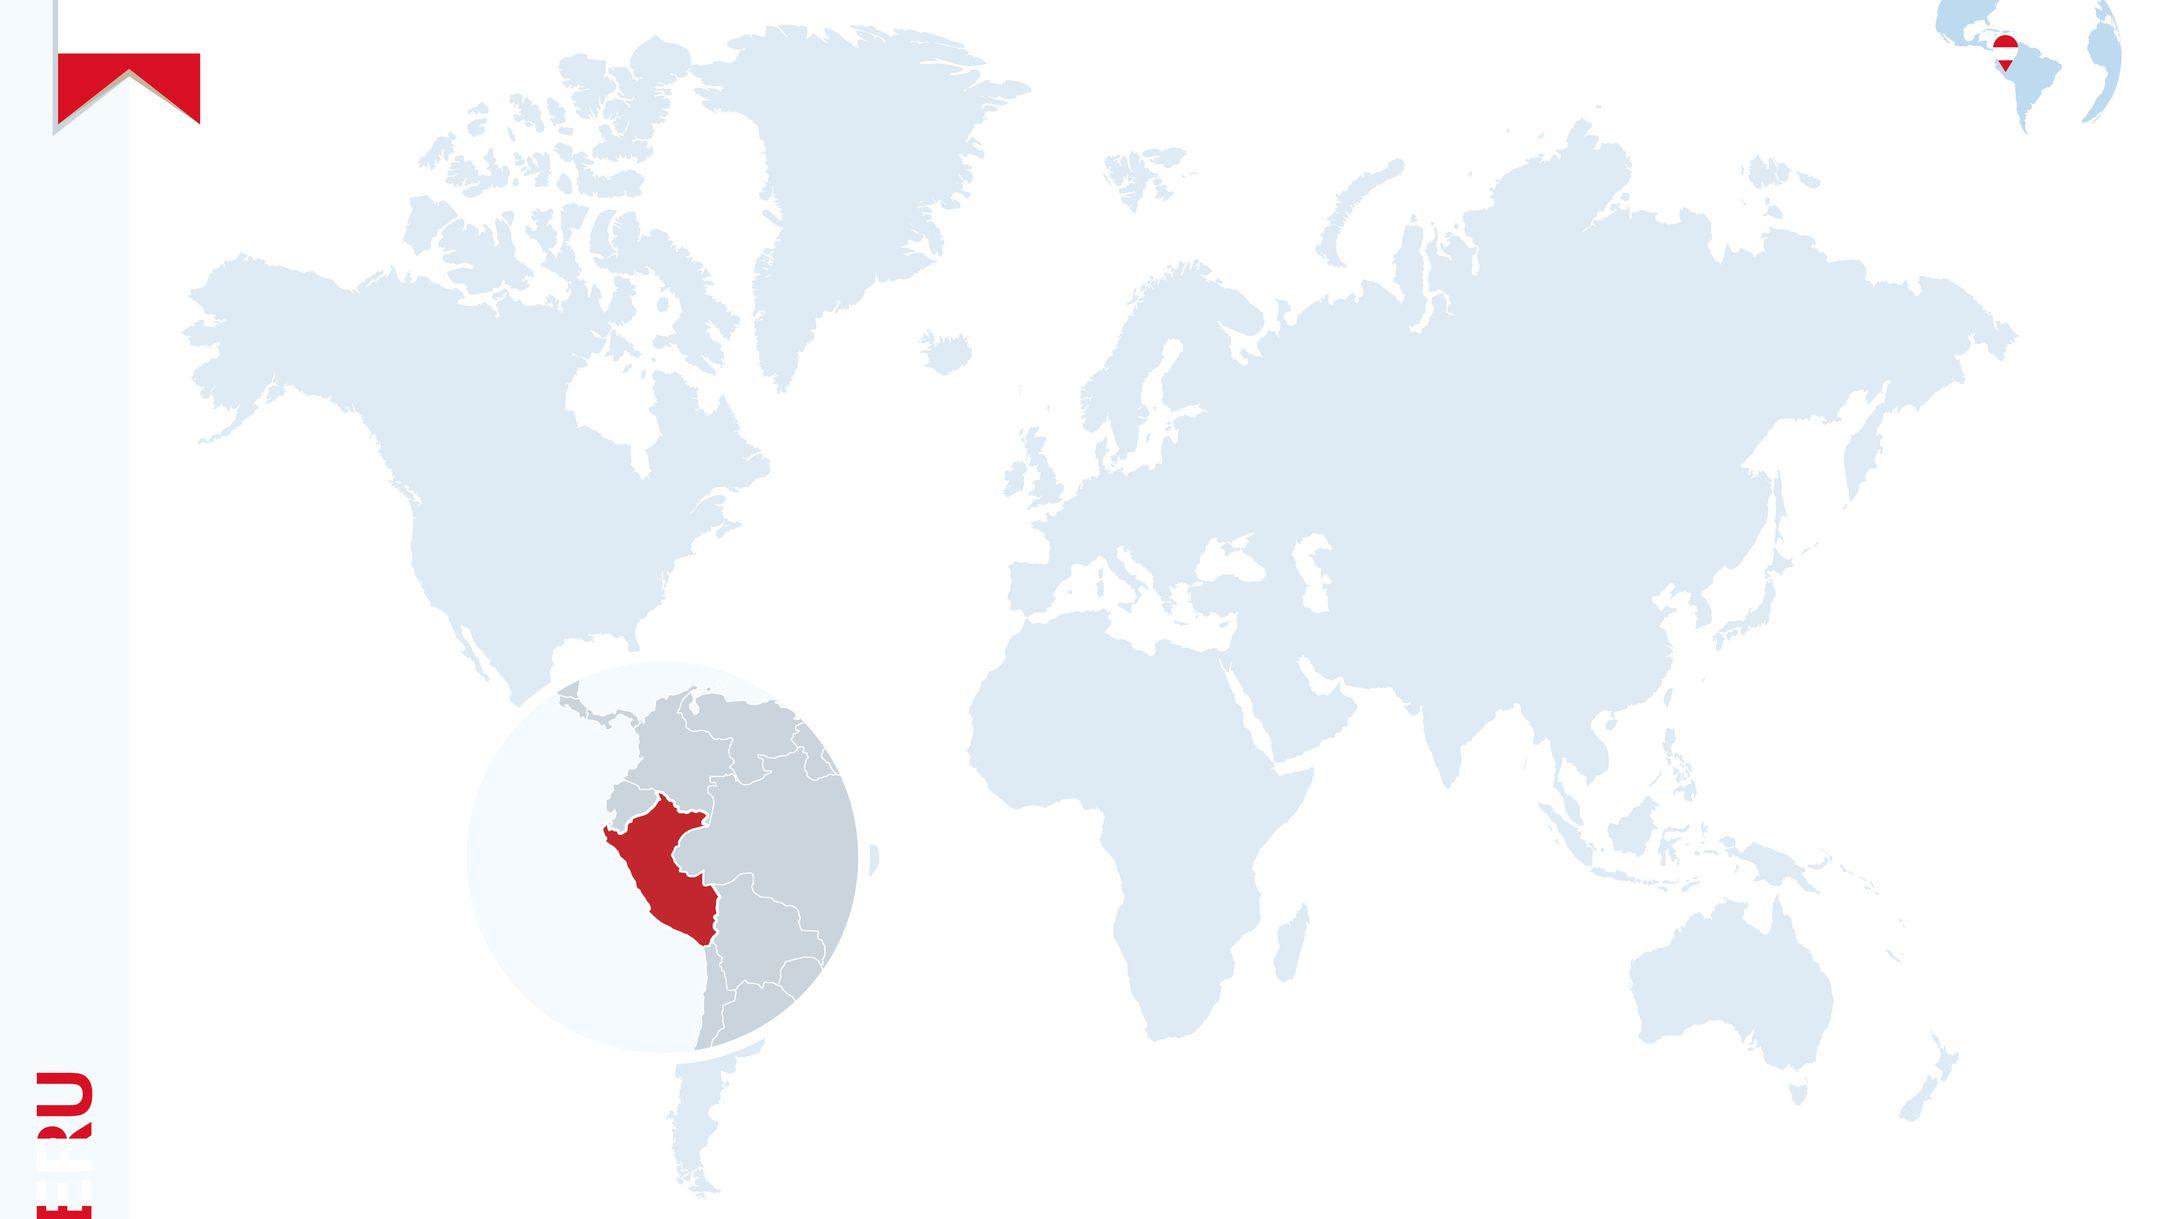 Sensational Location Of Peru On A Global Map Download Free Architecture Designs Scobabritishbridgeorg